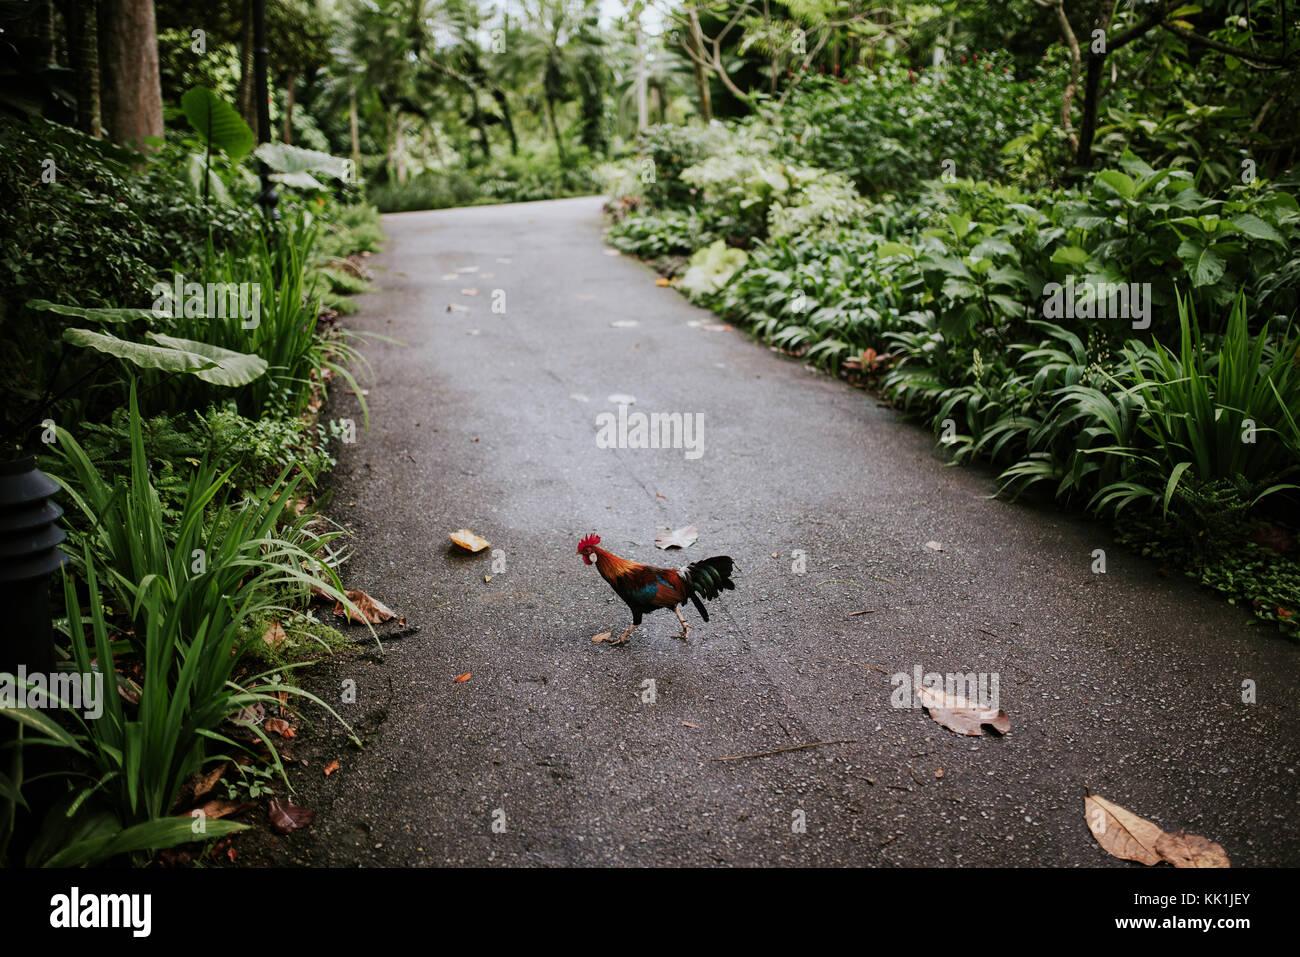 Bird crossing path in botanical garden, Singapore. - Stock Image